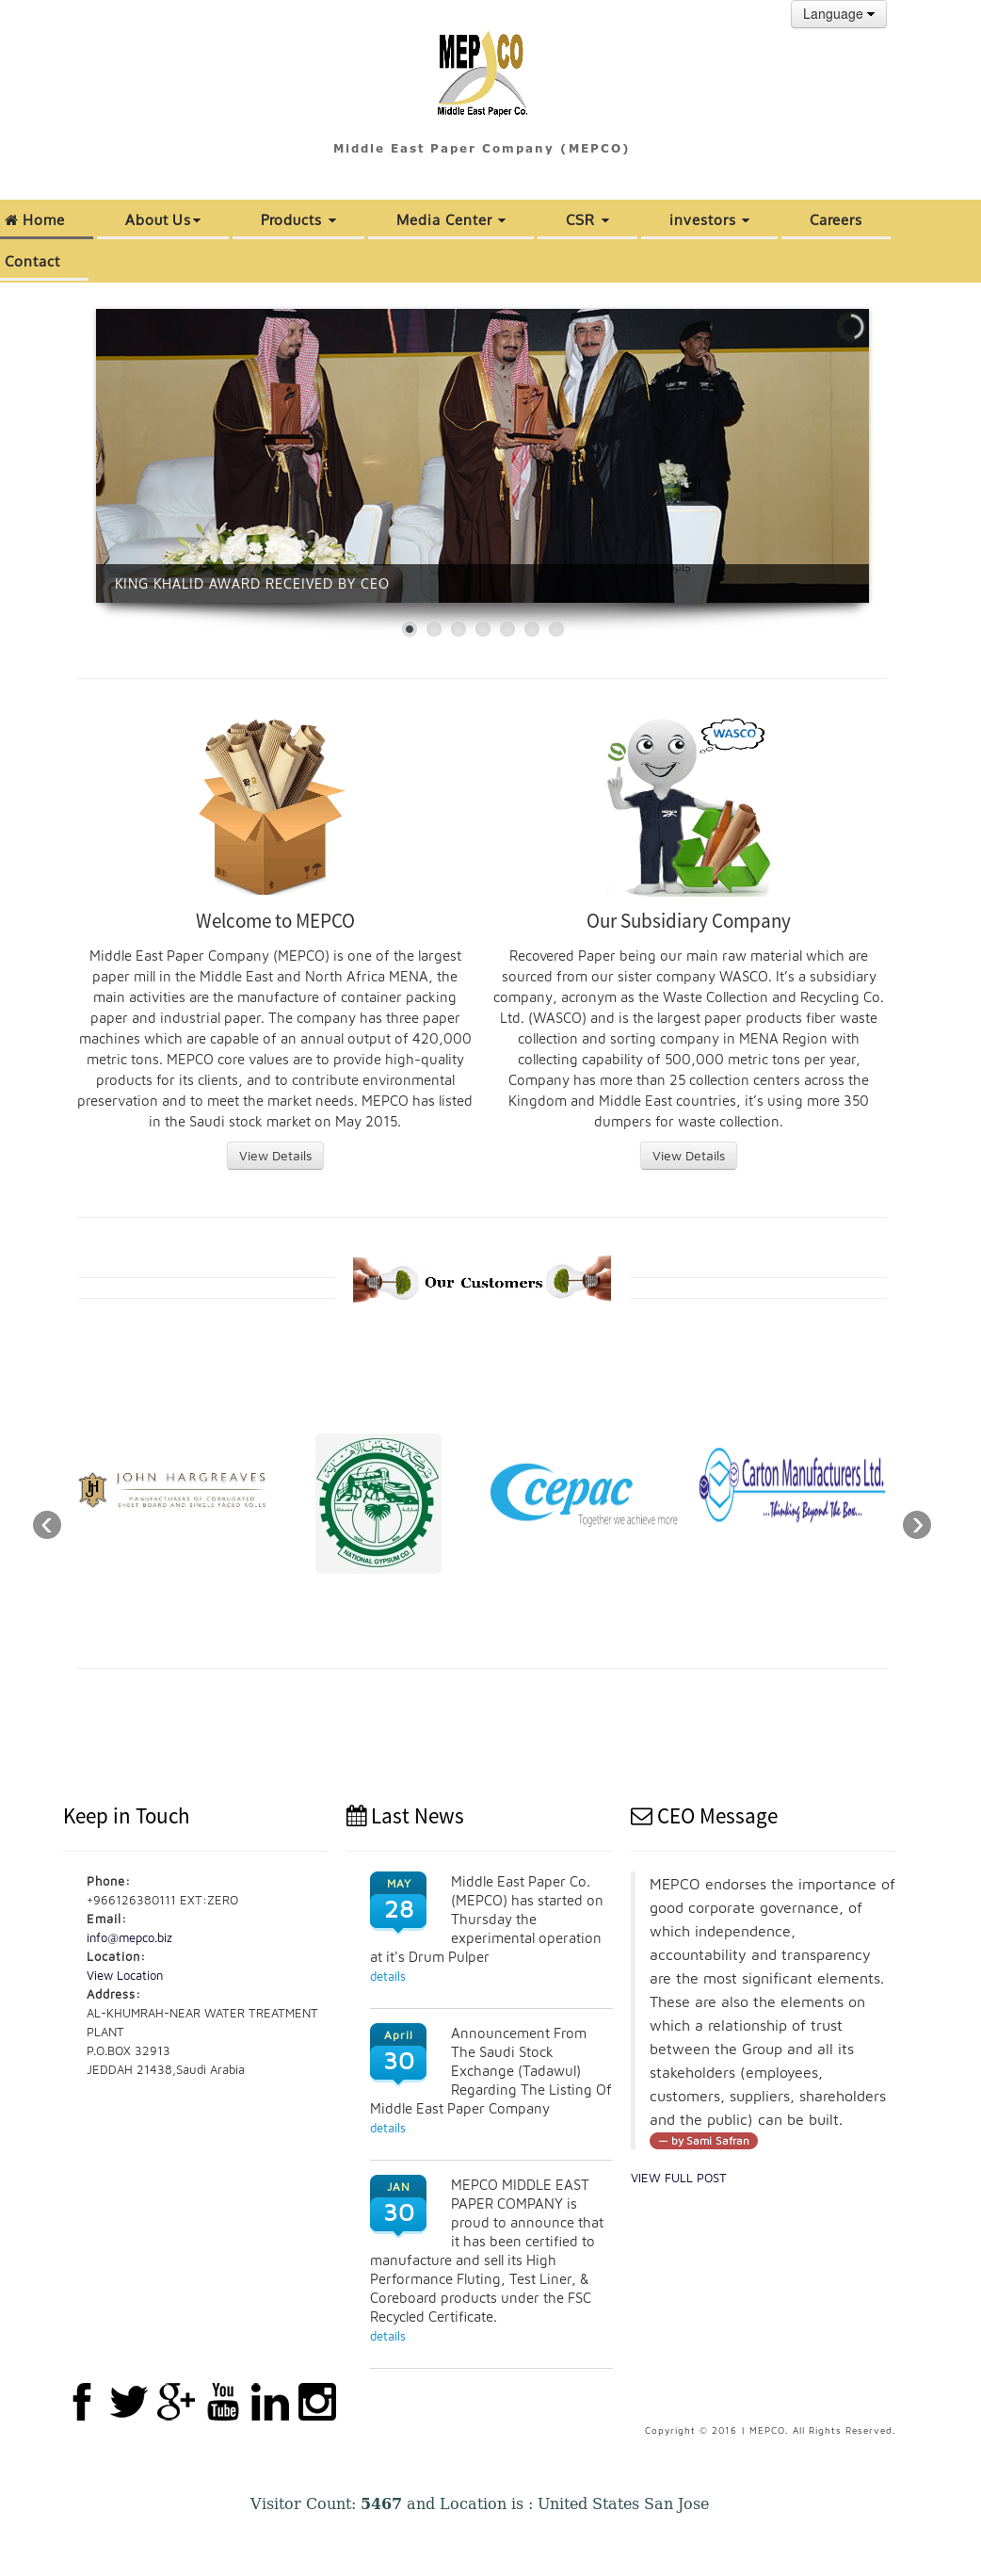 Owler Reports - Press Release: Mepco : MEPCO and WASCO